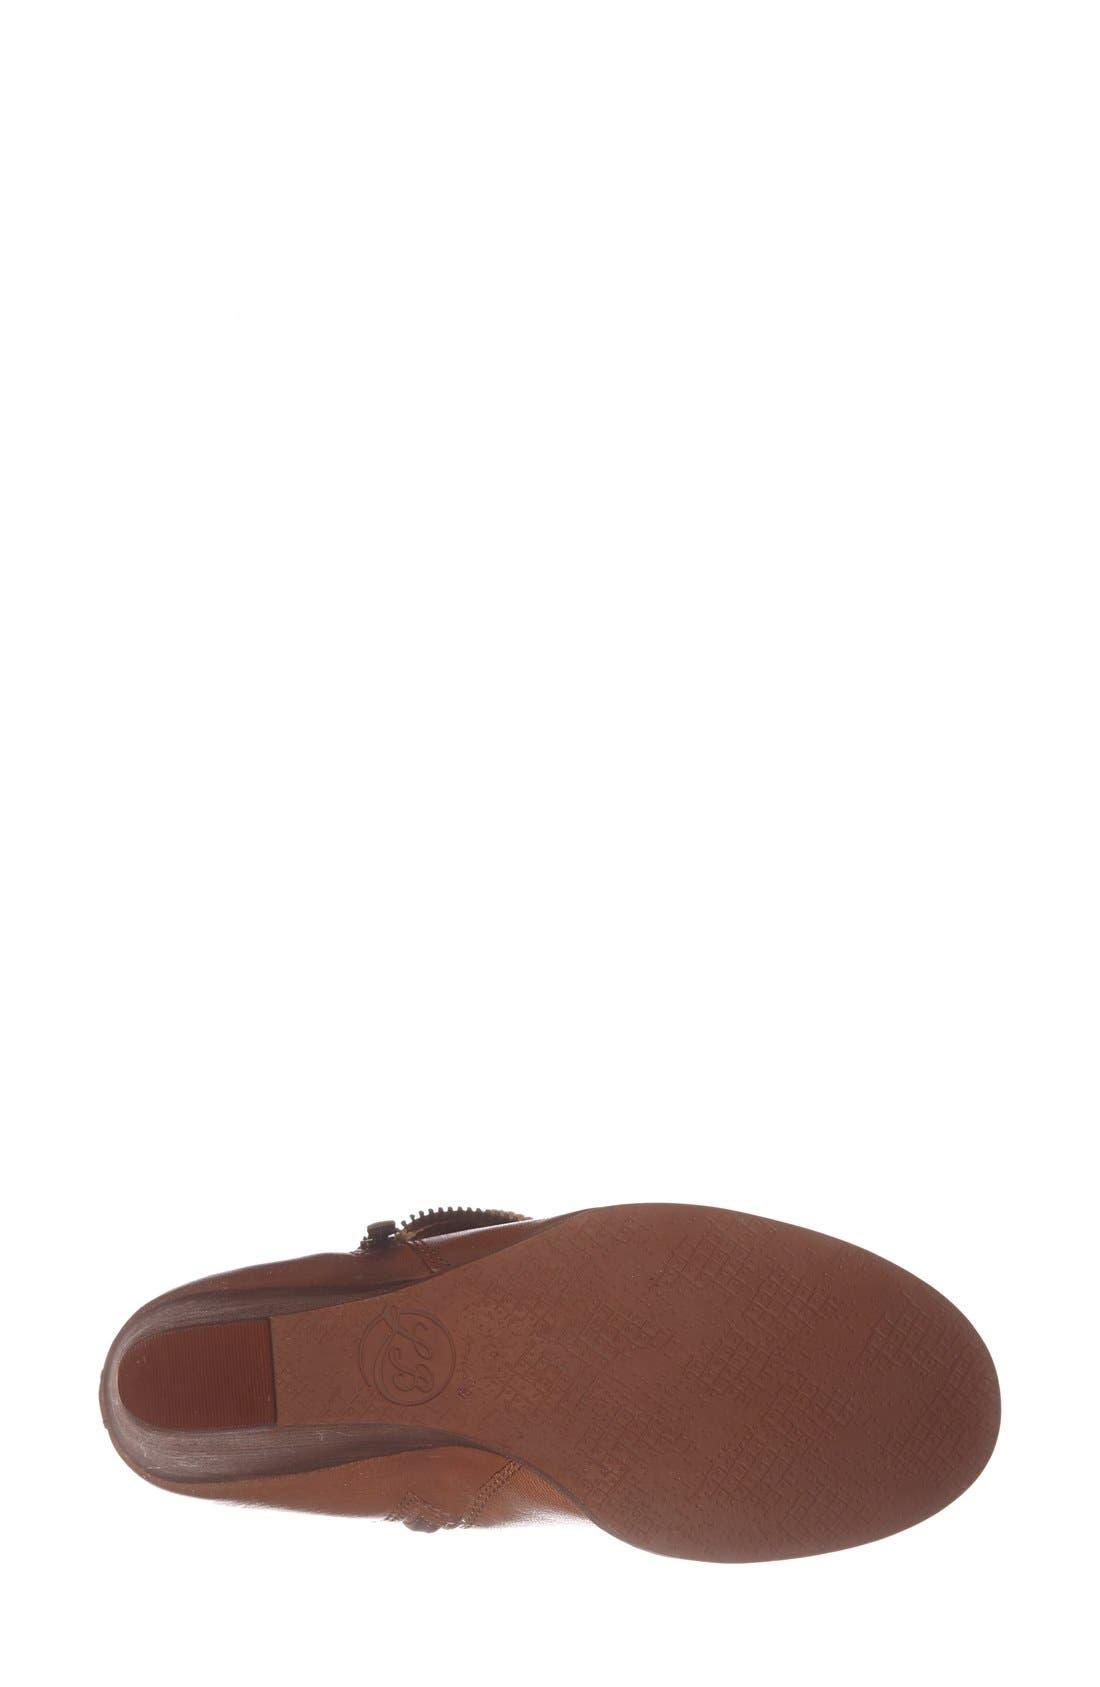 Alternate Image 4  - Lucky Brand 'Yorque' Wedge Leather Bootie (Women)